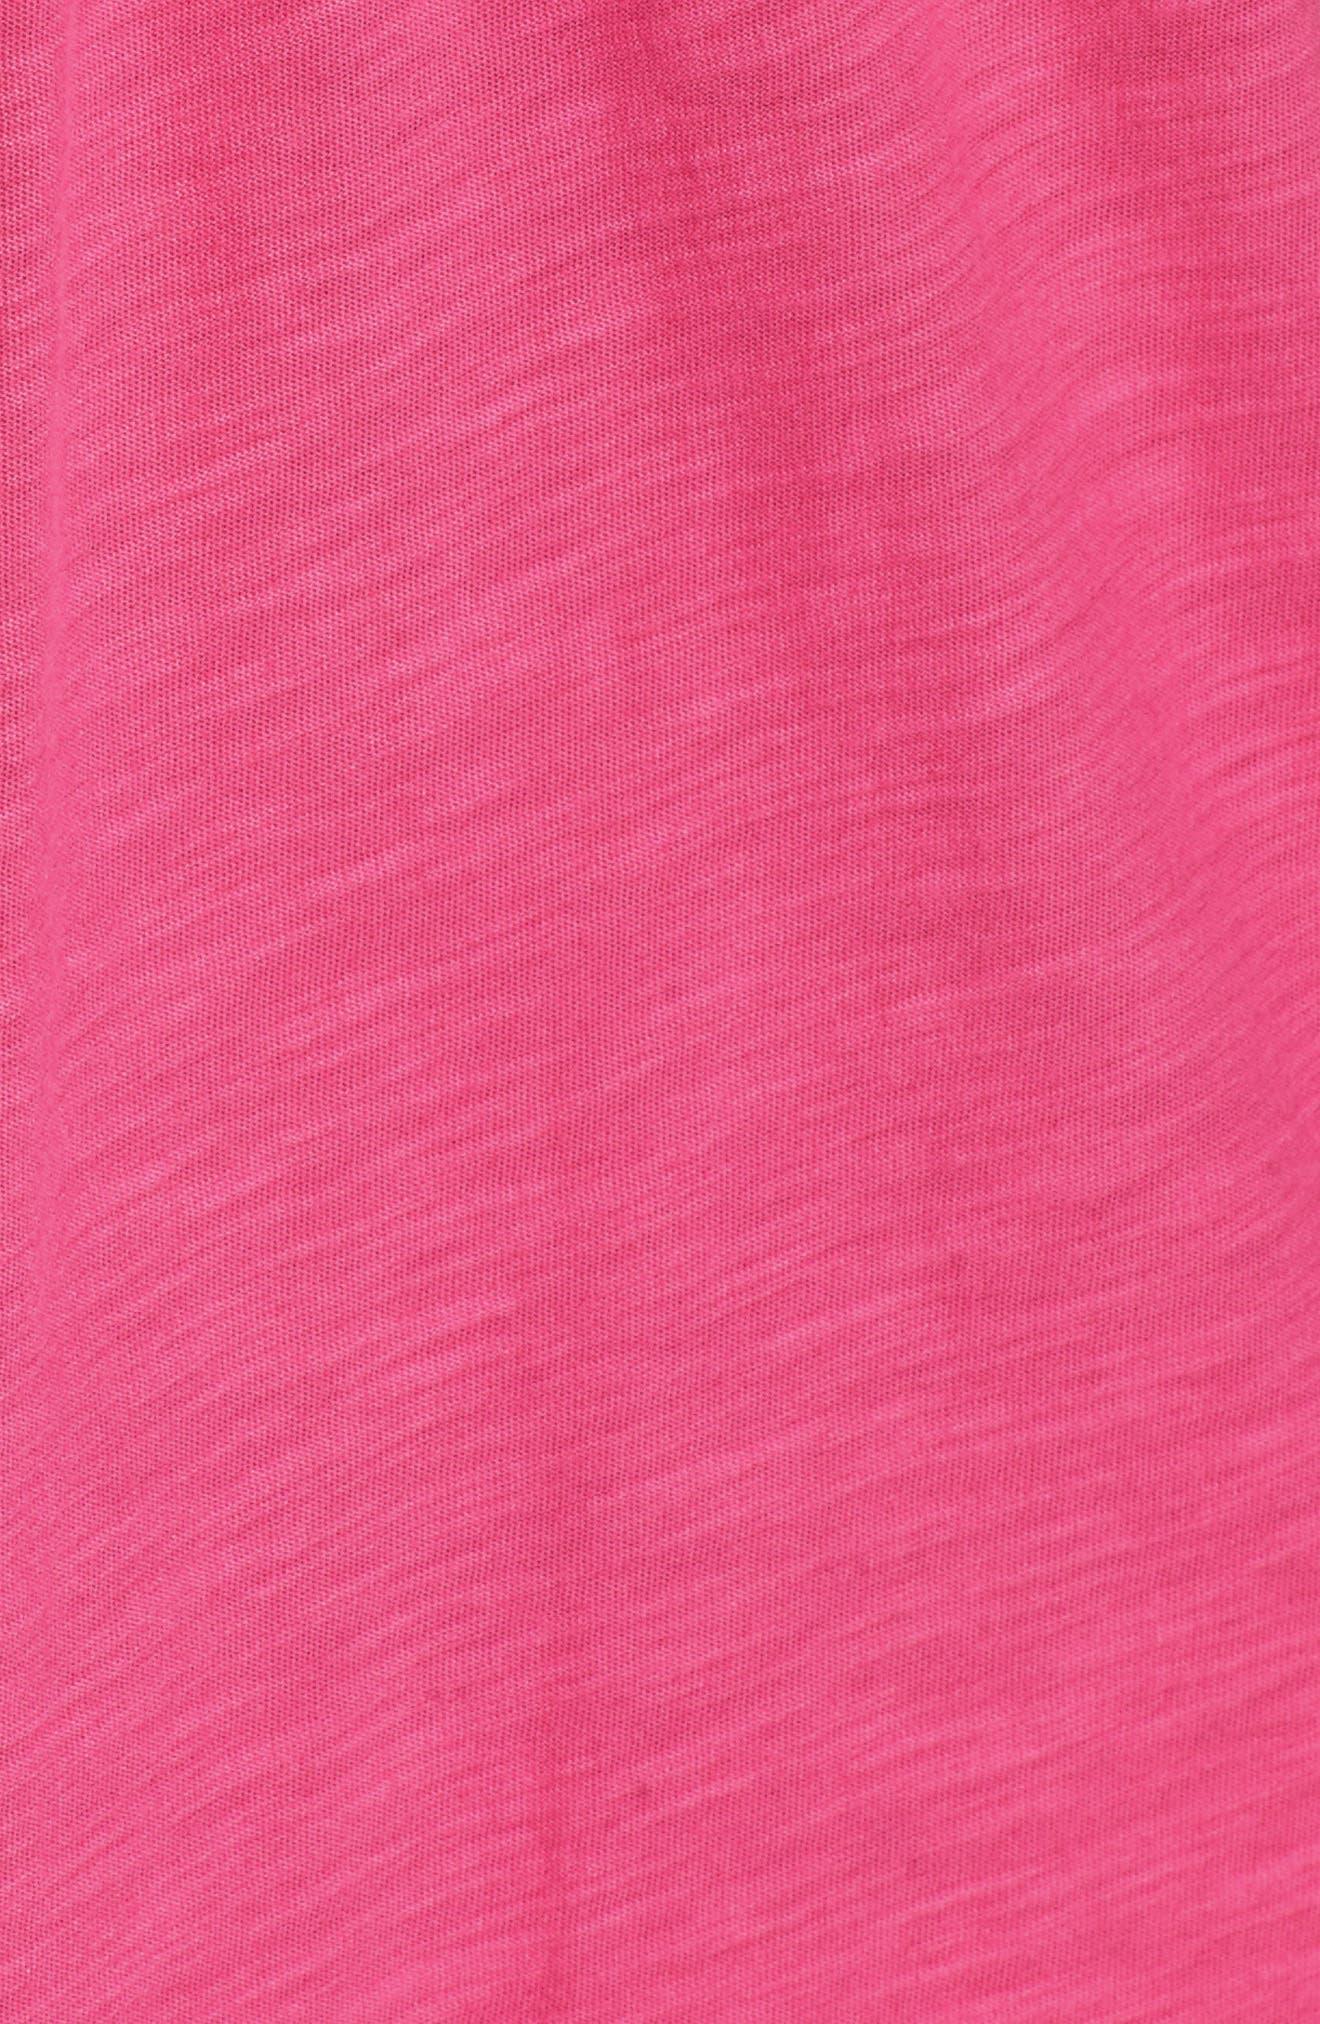 Arden Shift Dress,                             Alternate thumbnail 5, color,                             Bright Blush